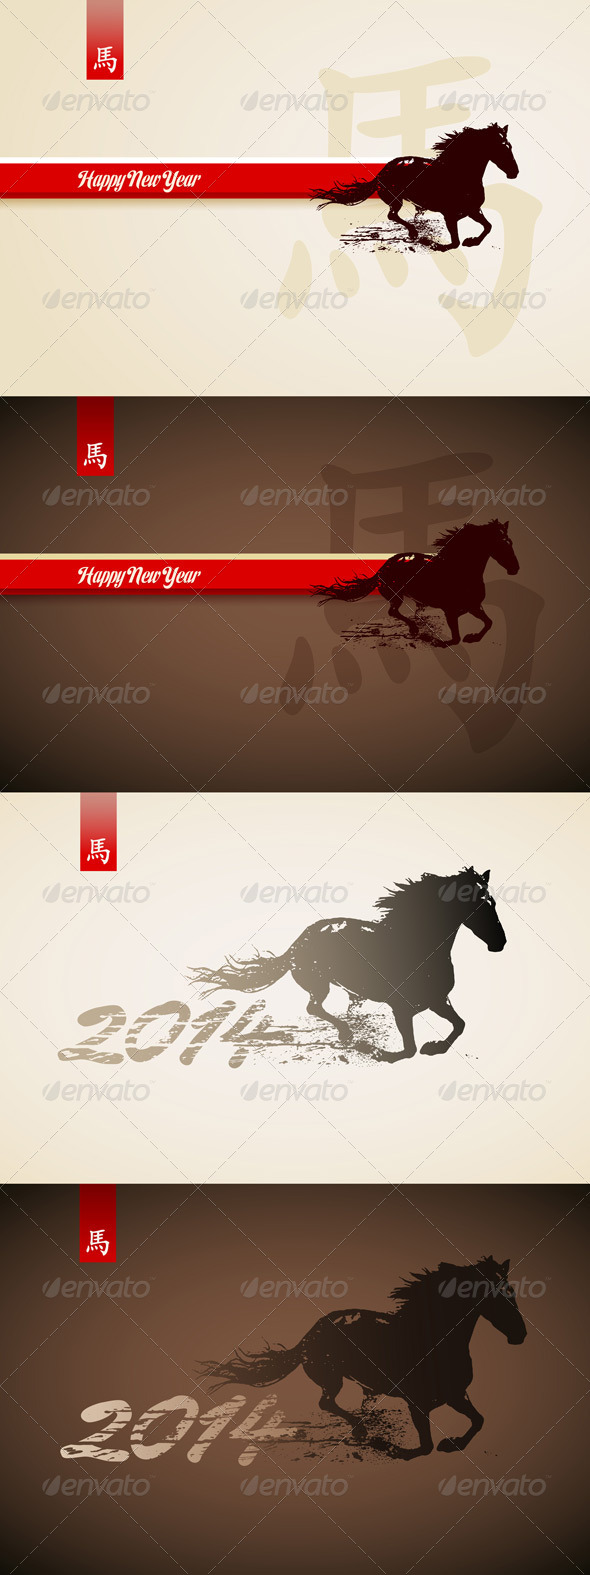 Chinese New Year 2014 - New Year Seasons/Holidays